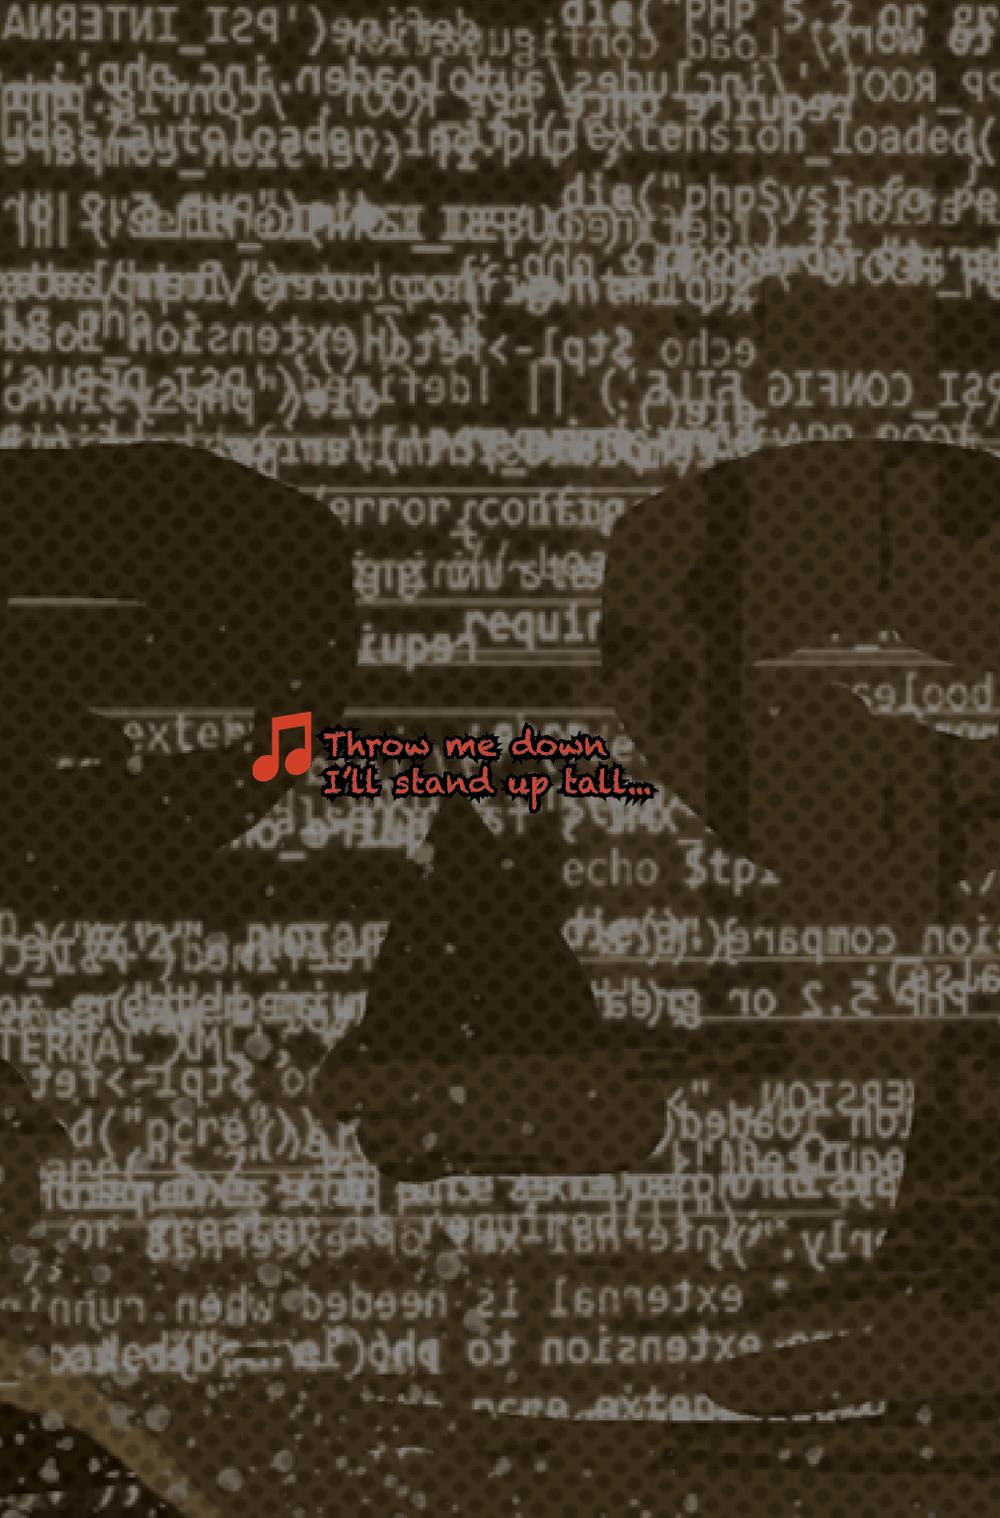 M2_SA_Netscout_GraphicNovel_FINAL_ForPrint2.png